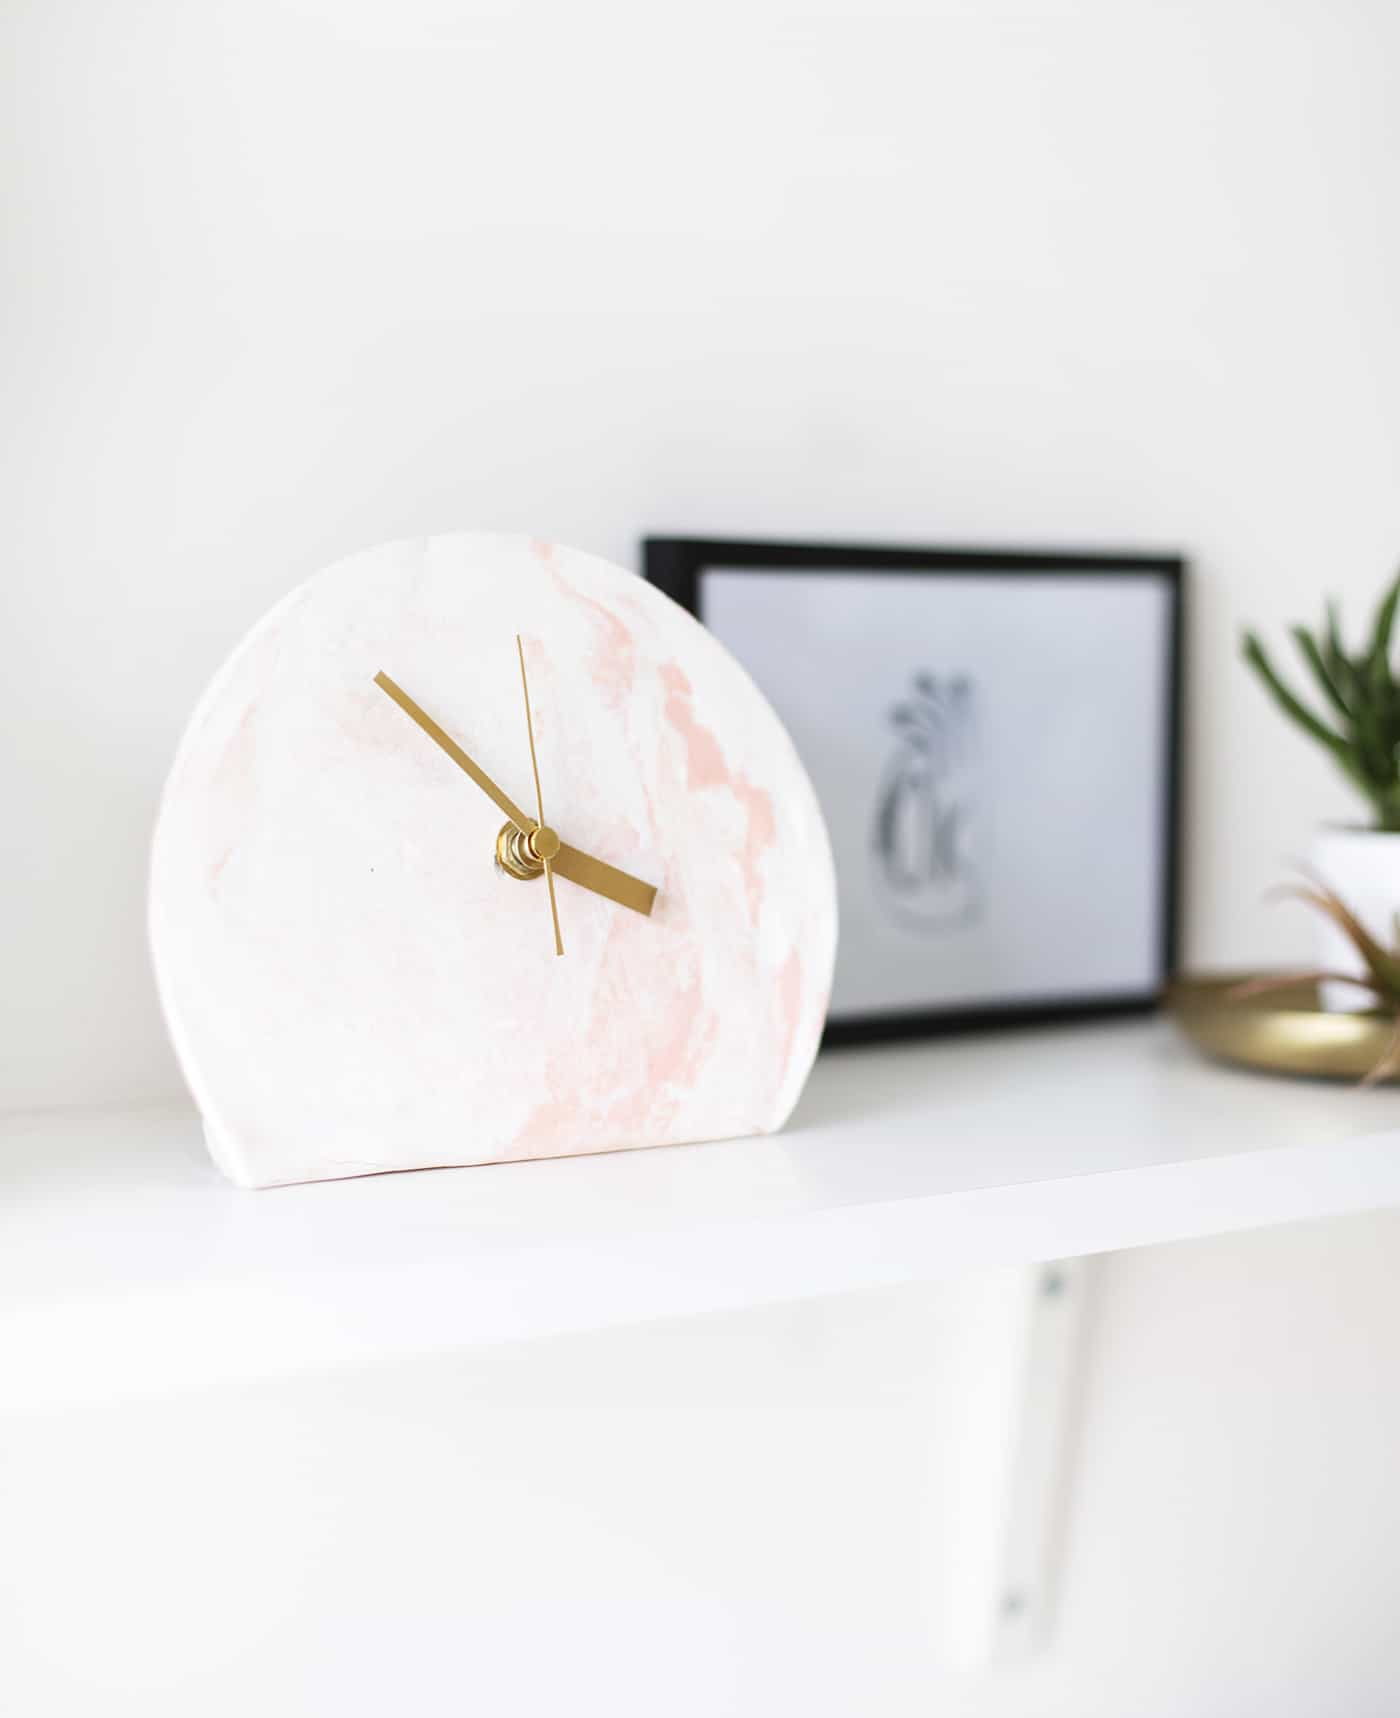 Diy marble clock